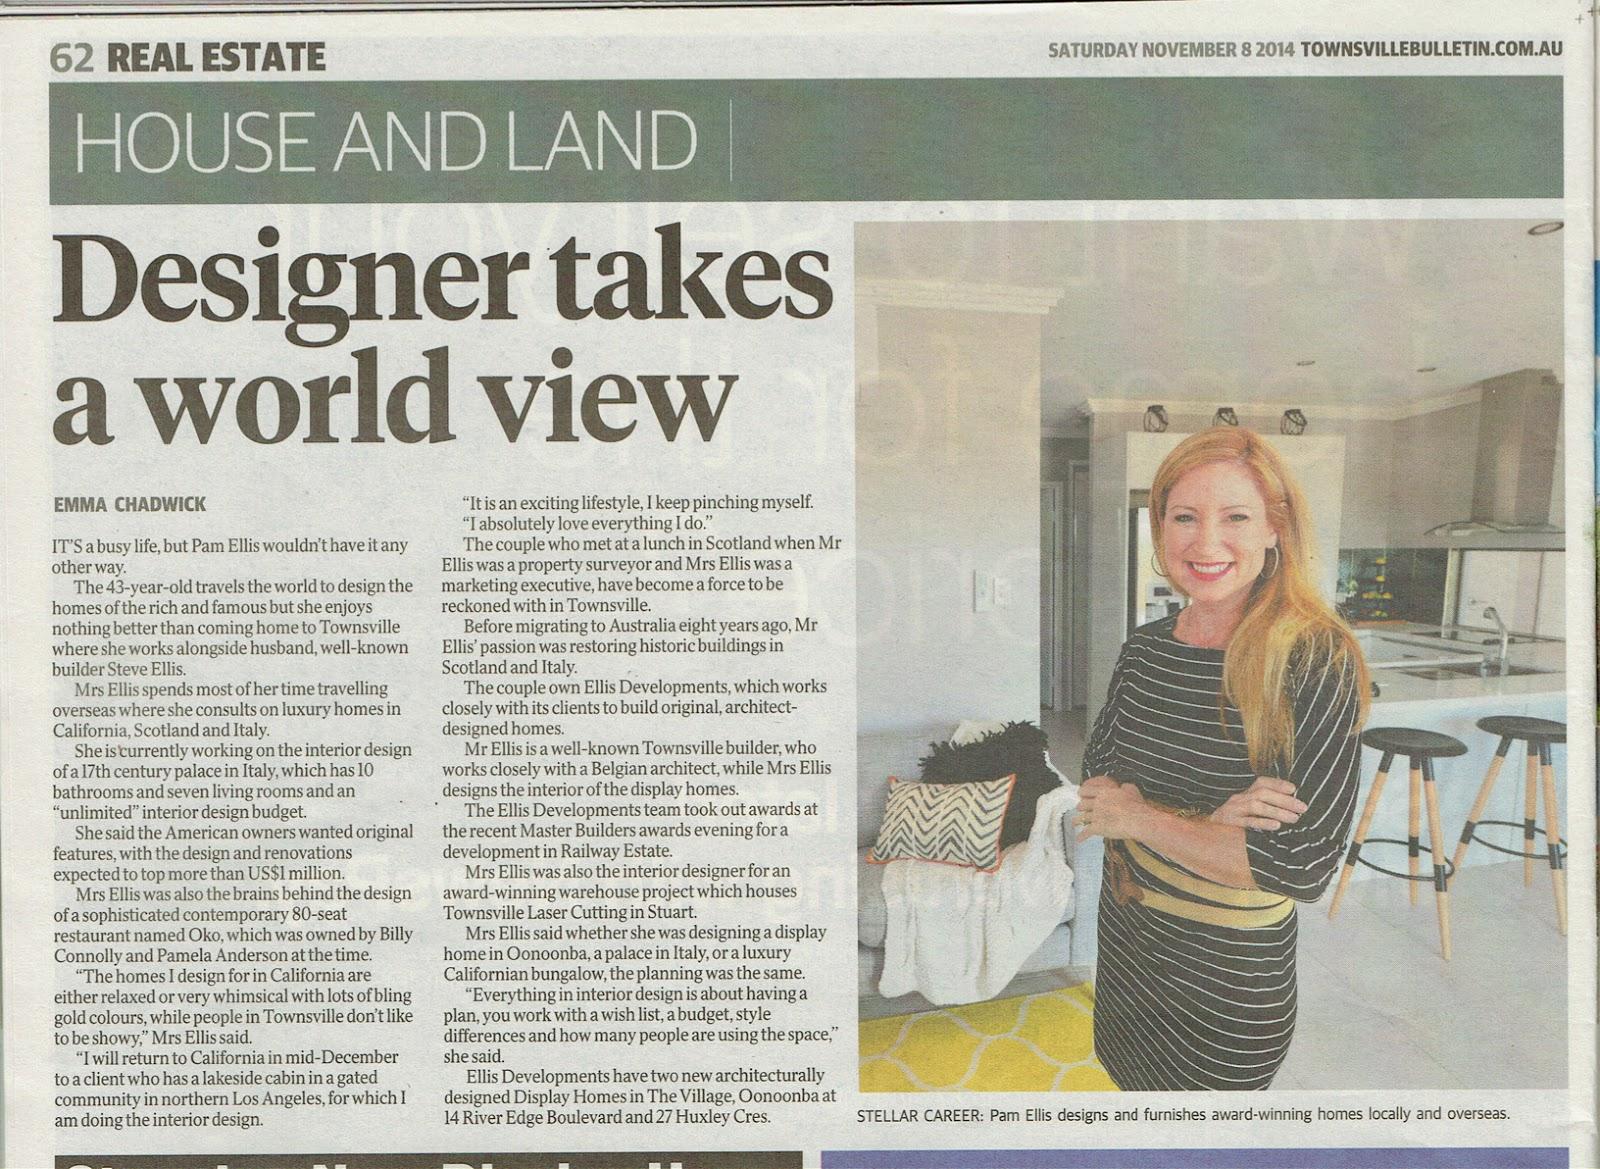 Designer takes a world view_PamEllisInternational 8 November 2014.jpg